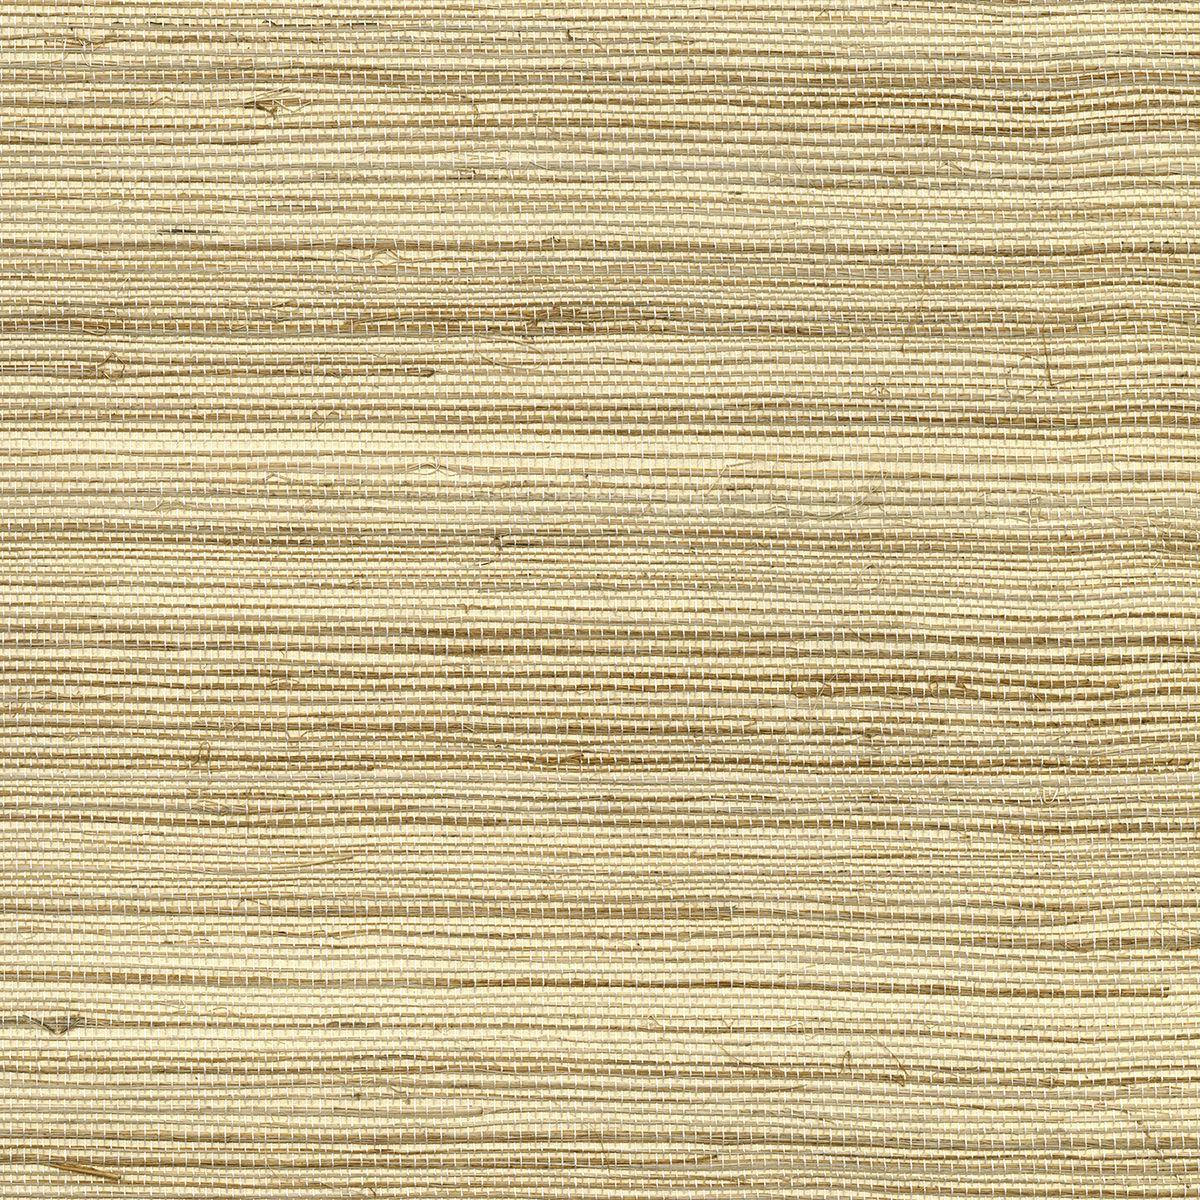 2829-80009 - Changzou Beige Grasscloth Wallpaper - by A ...